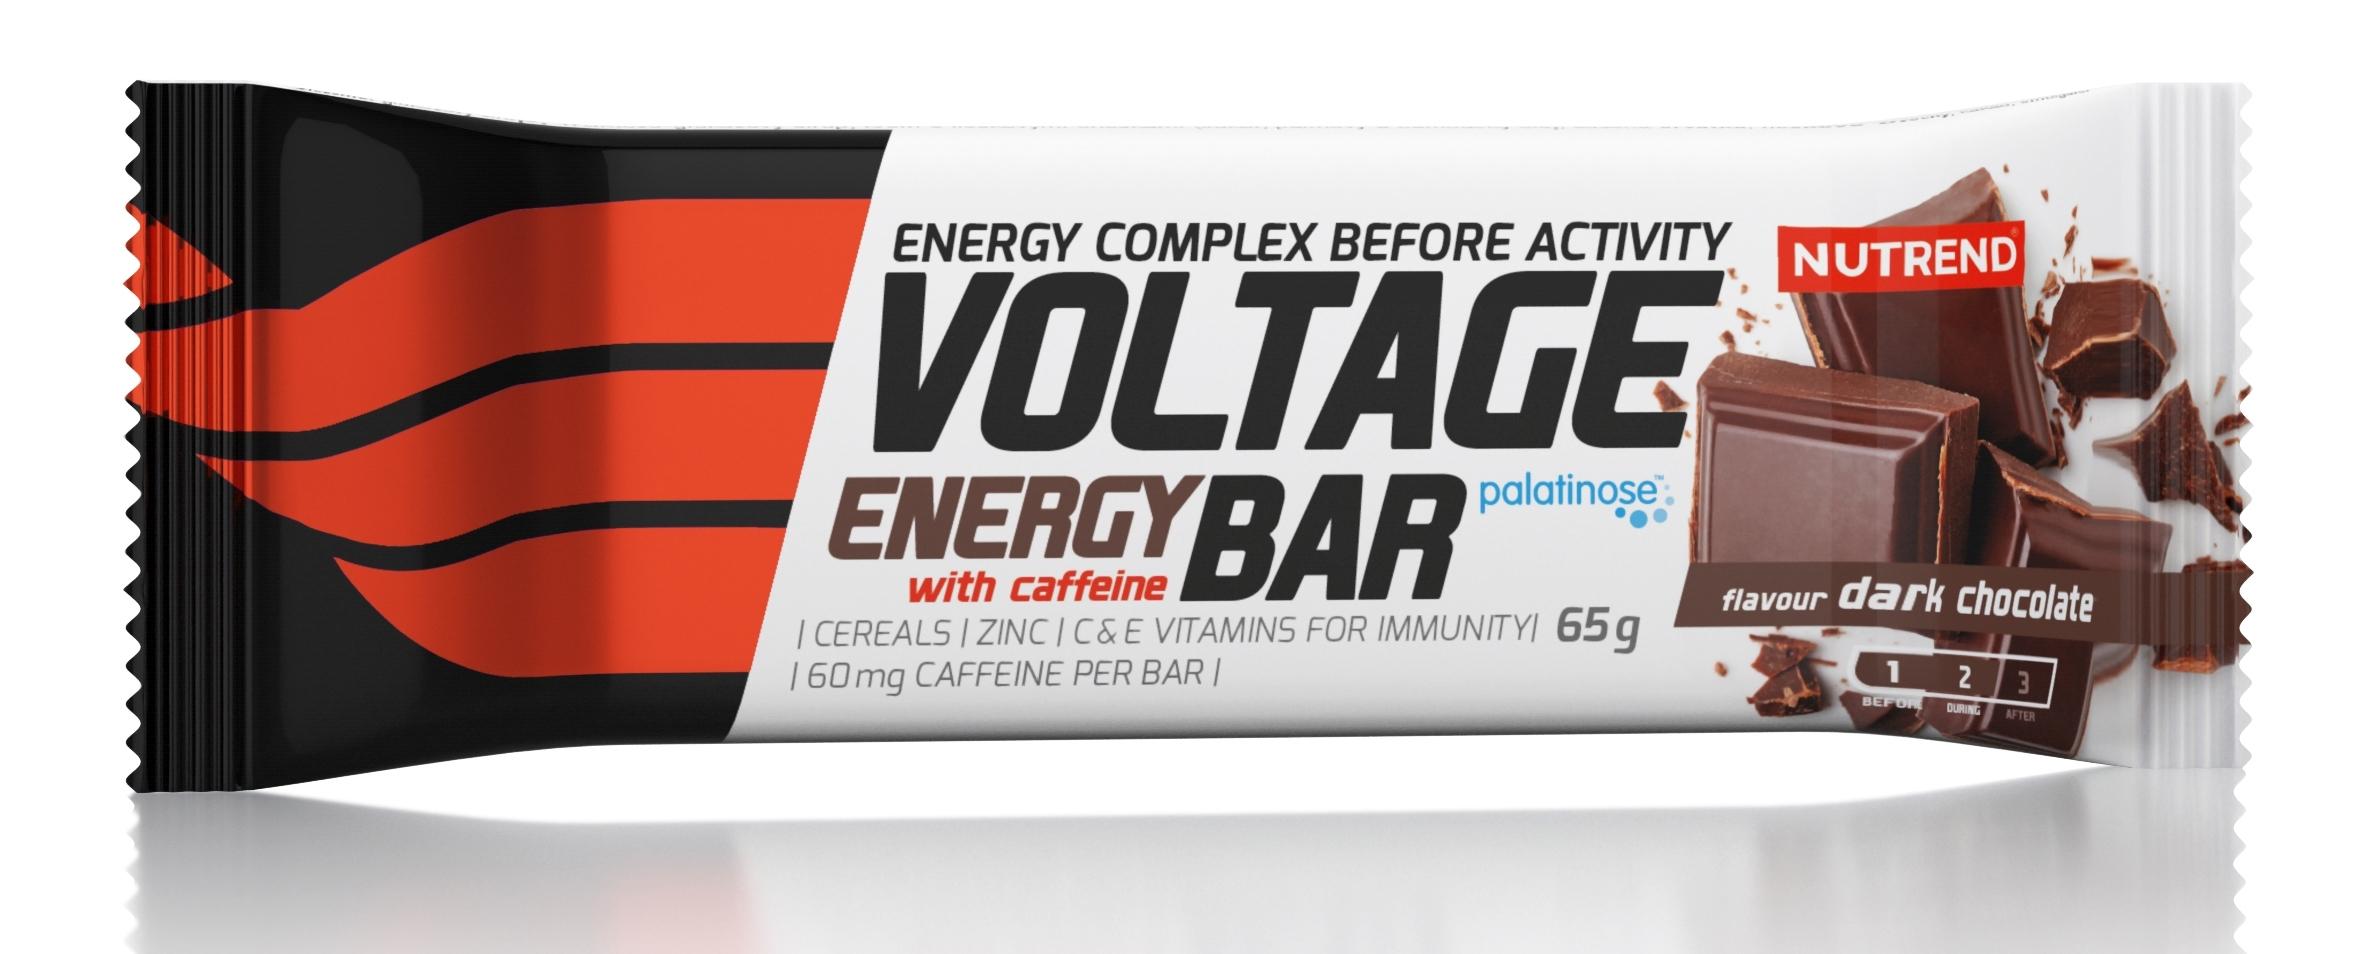 tyčinka VOLTAGE ENERGY BAR 65g s kof., h. čokoláda